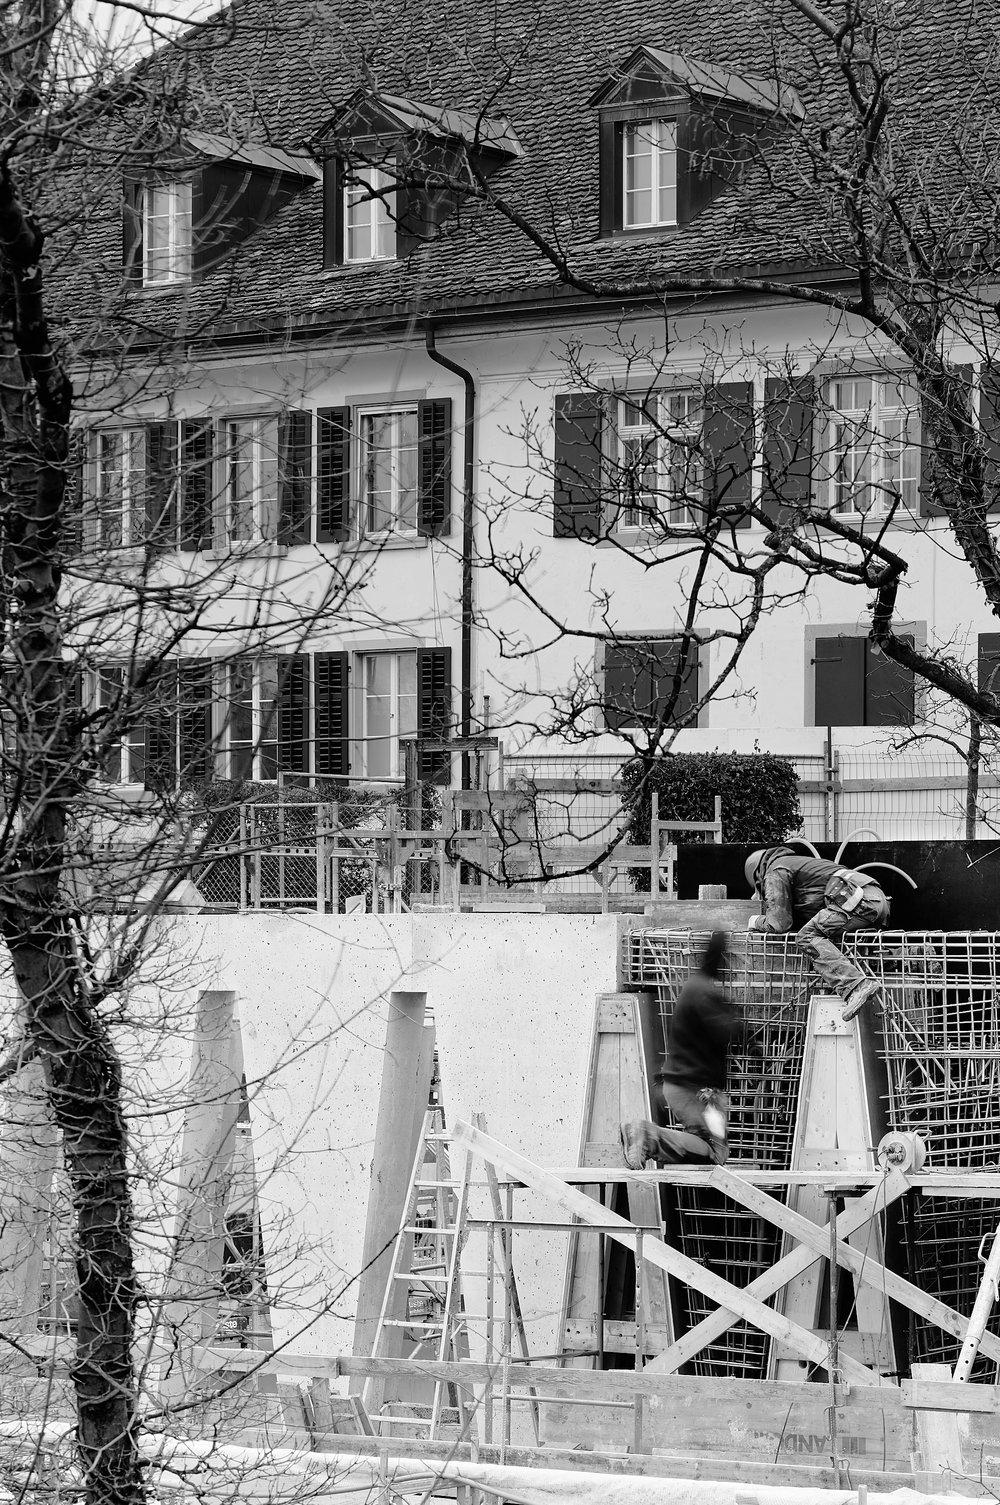 EBV_Suiza2_0898.jpg